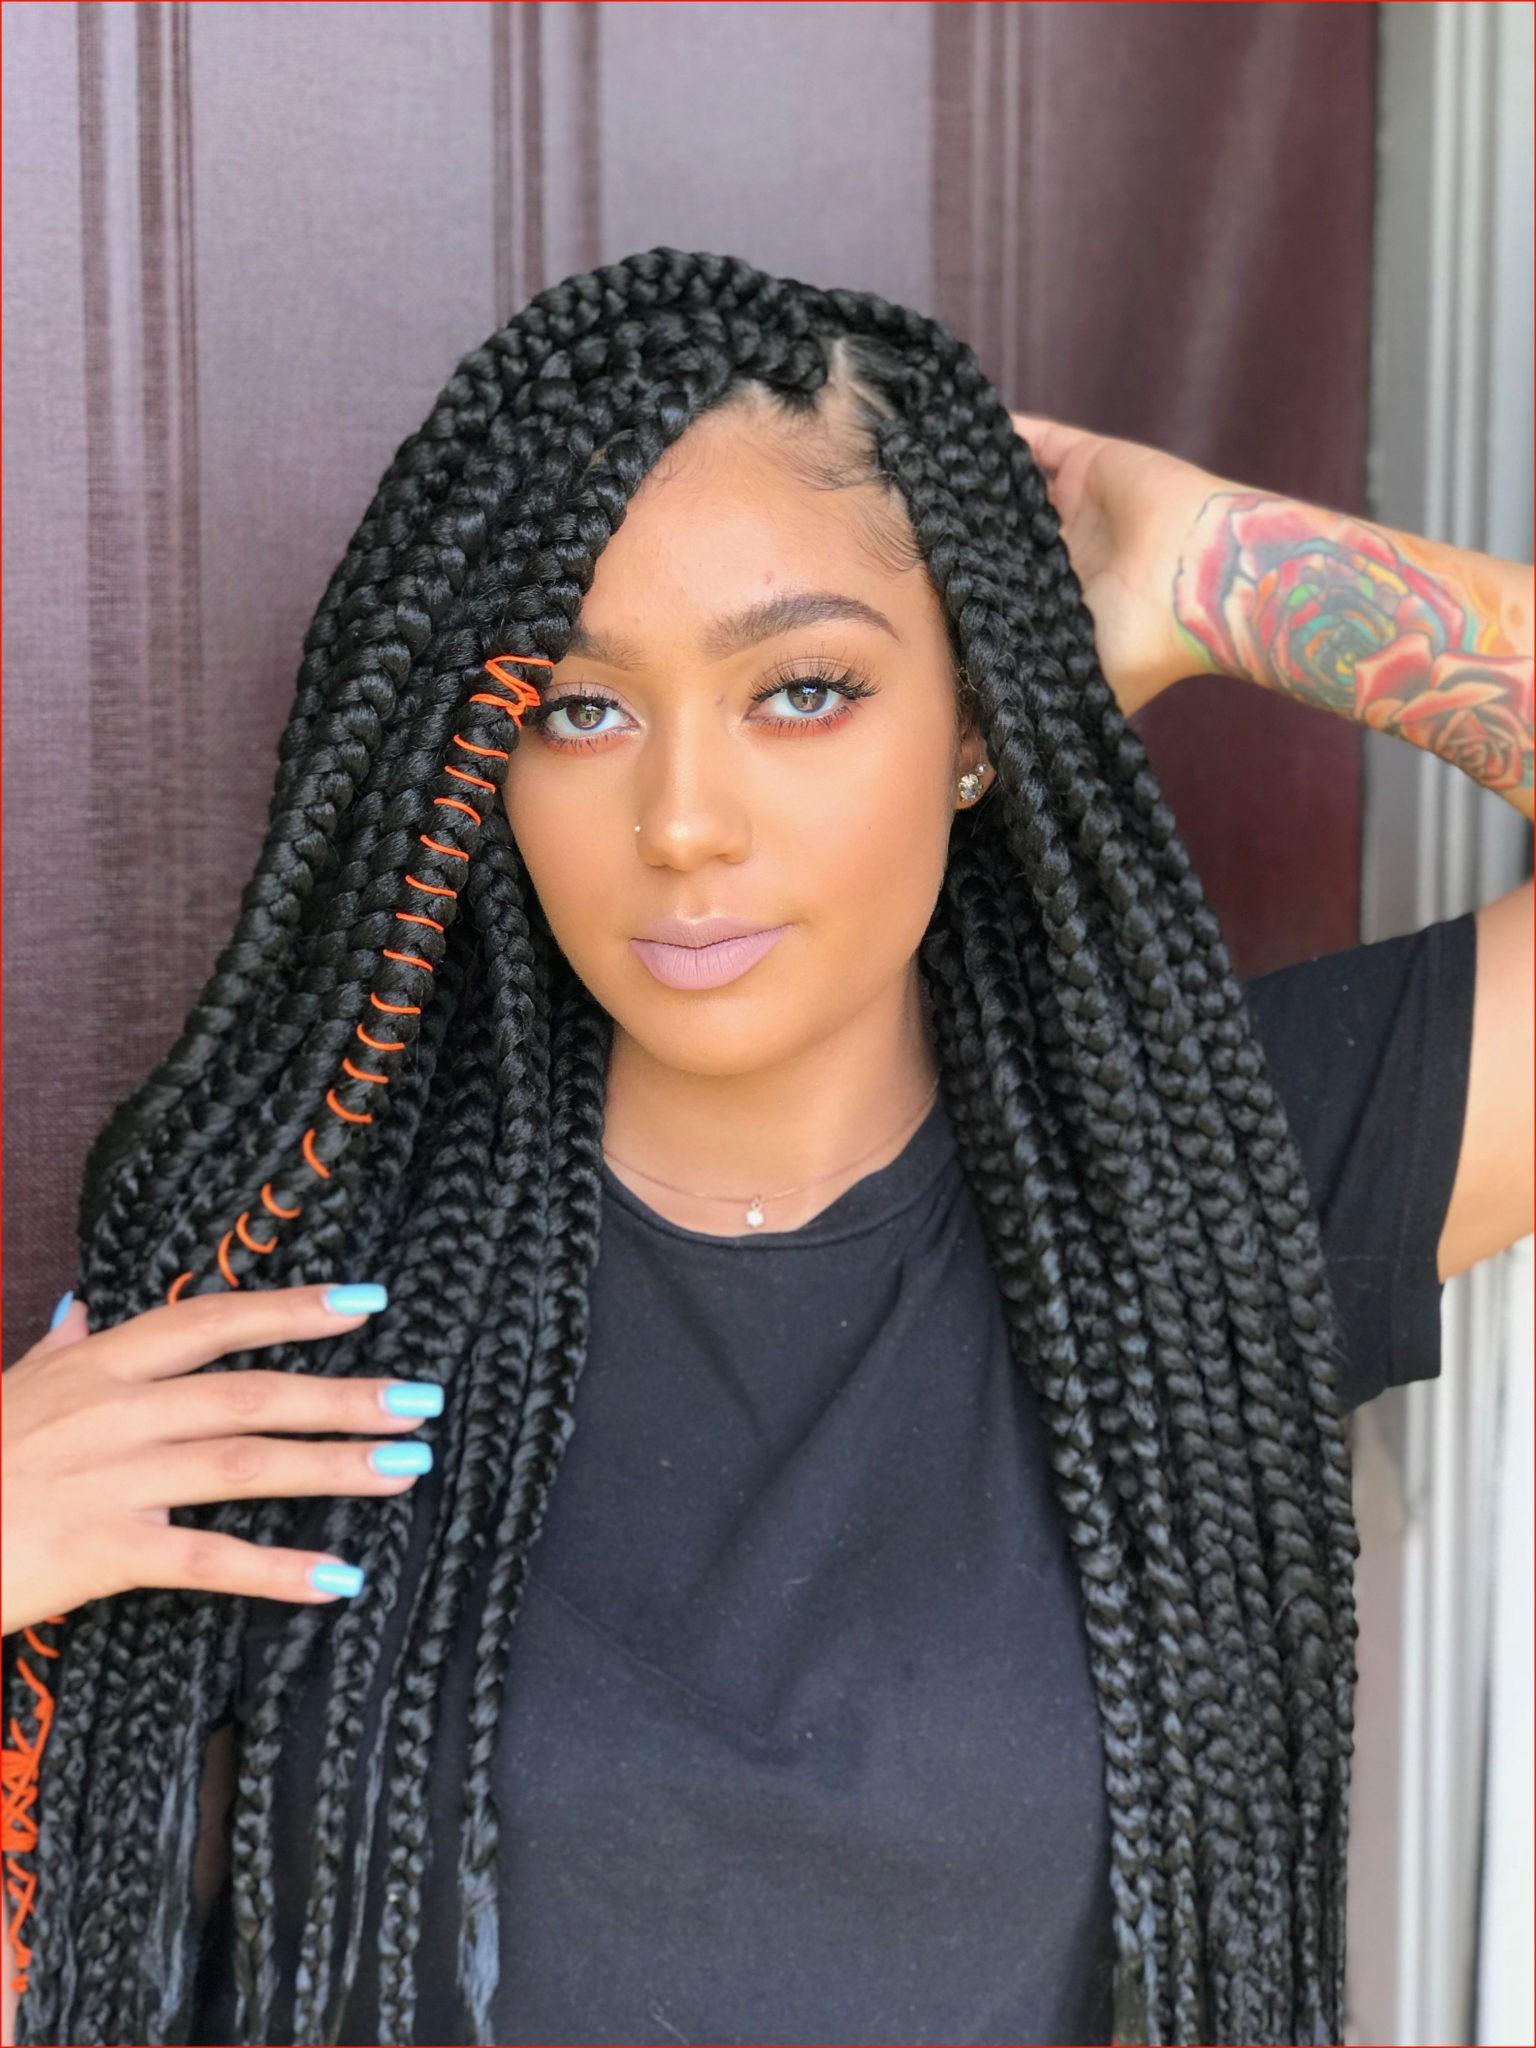 hairstyles-hair-braid-styles-the-best-single-braids-updo ...